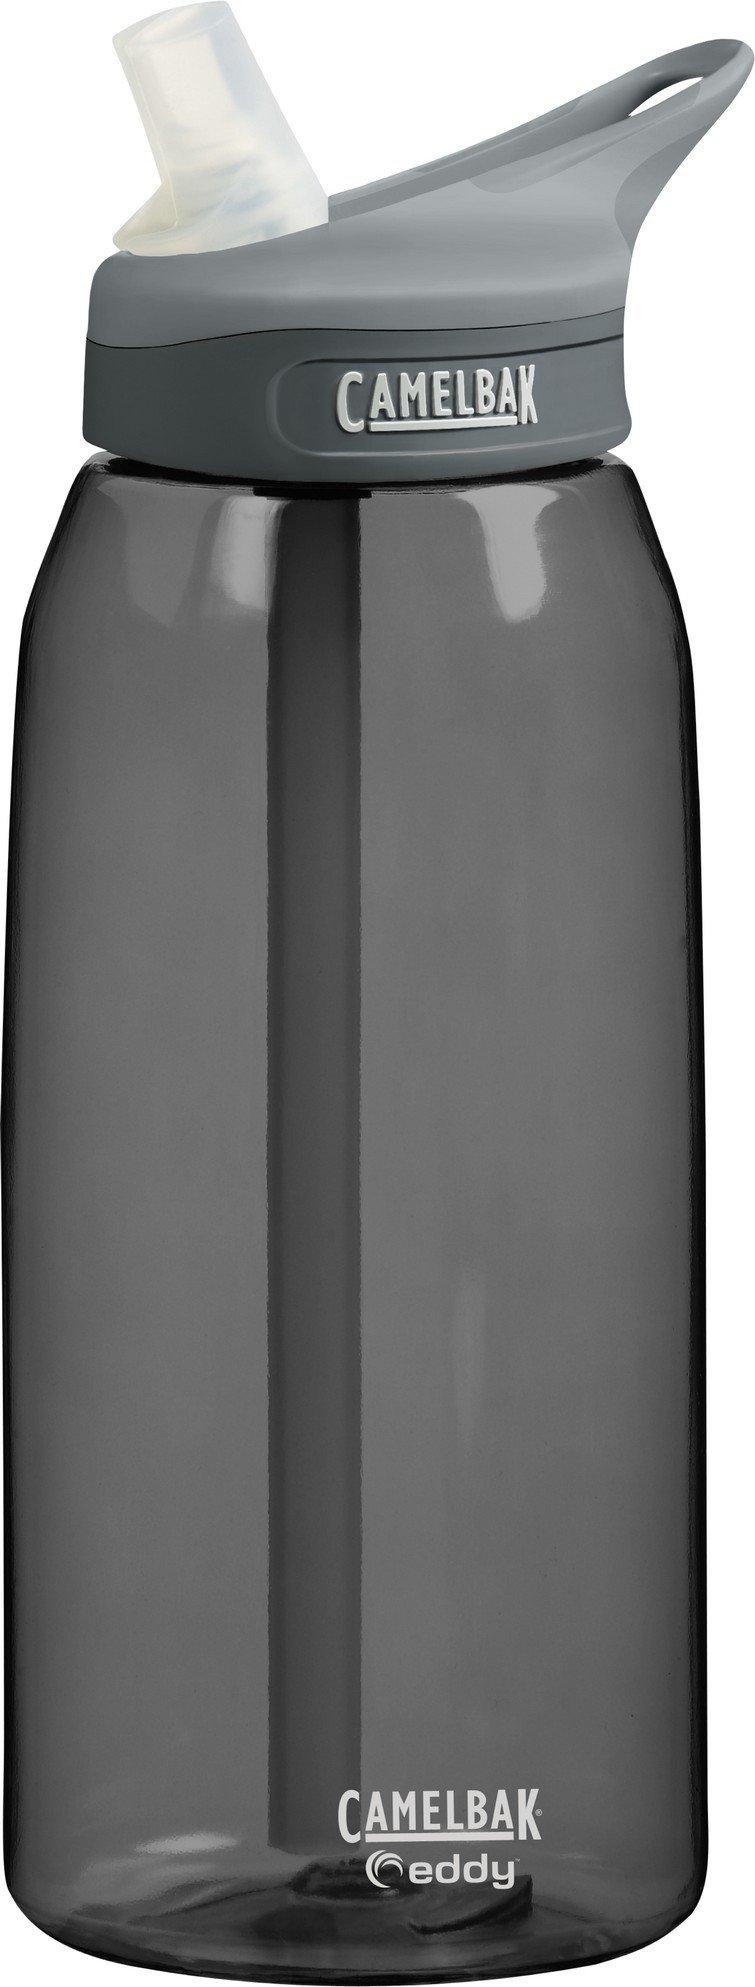 Camelbak Eddy Bottle (1-Liter/33-Ounce,Charcoal) by CamelBak (Image #1)